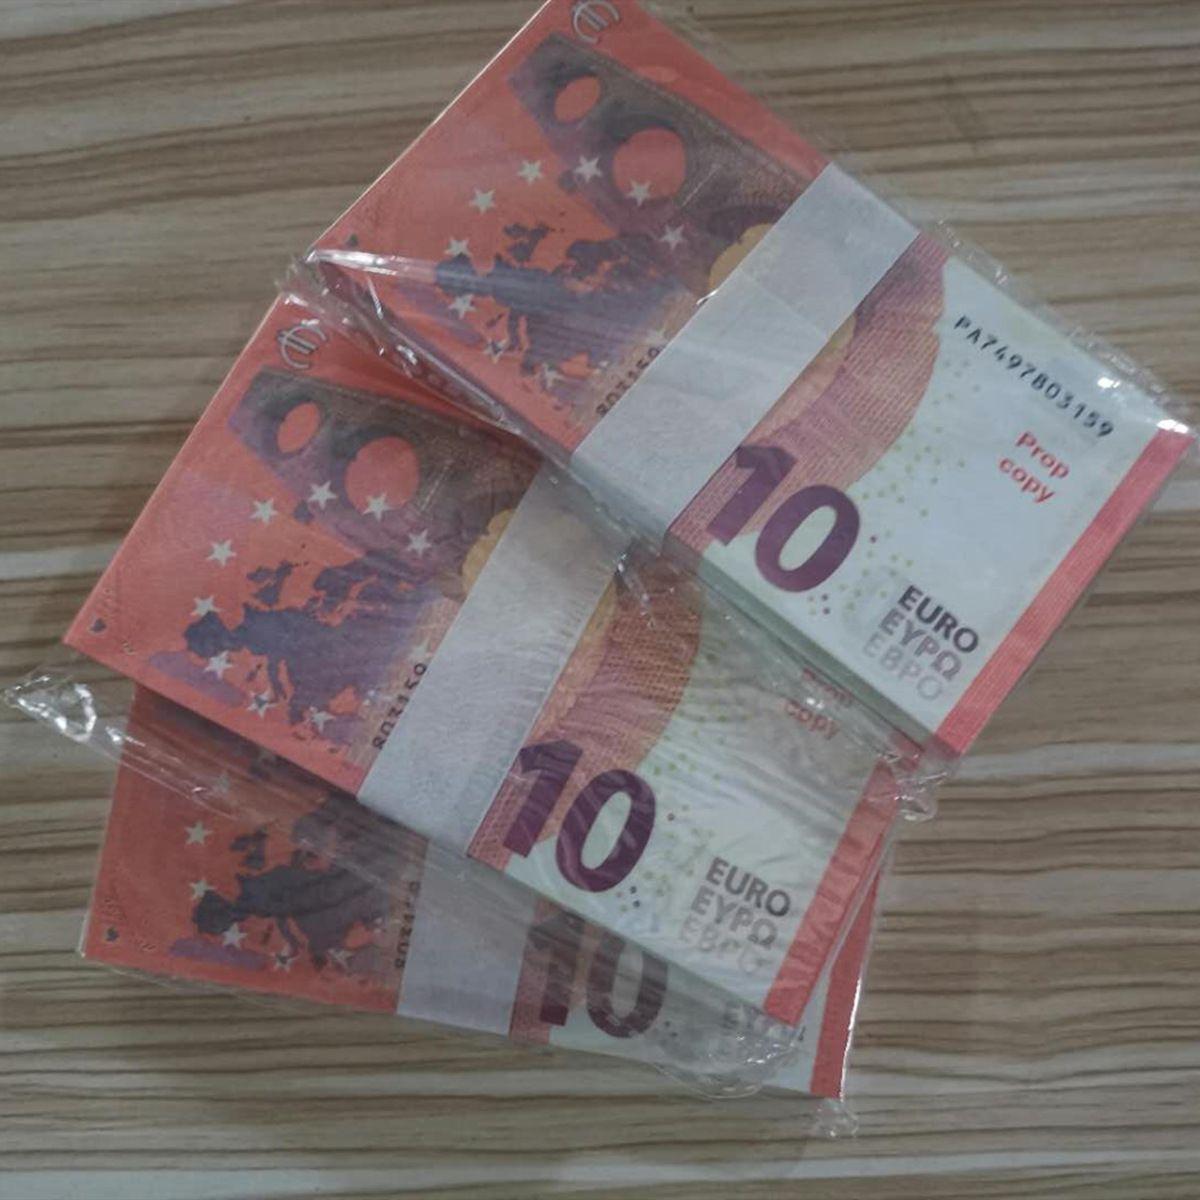 10 EUR 유로 축제 파티를 수집 가짜 게임 환율 소품 플레이 돈은 농담 선물 용품 10 * 25 * 5